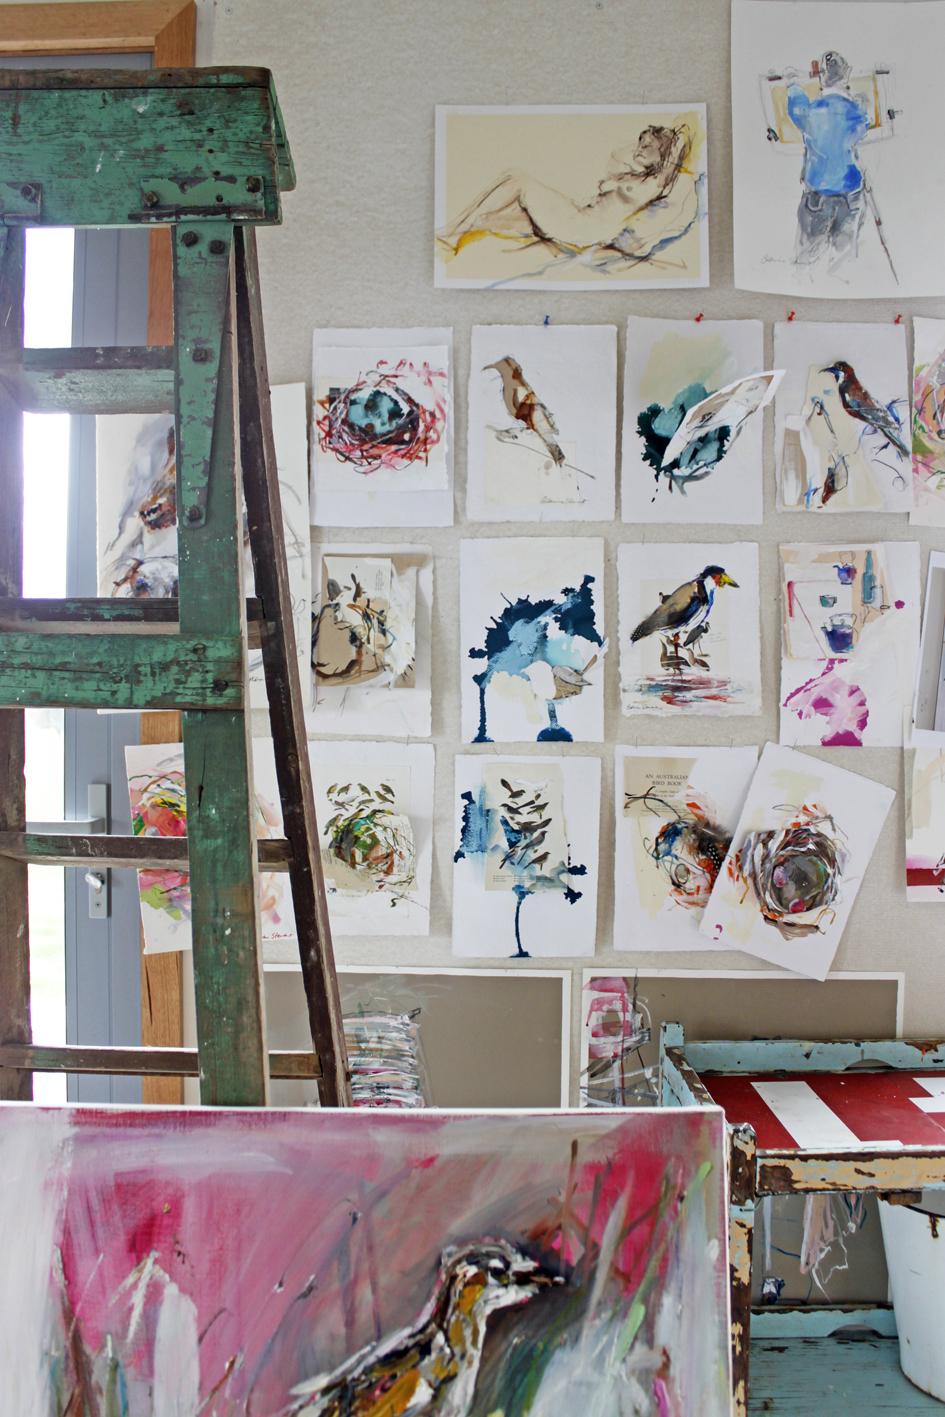 Australian artist studio visit, Catherine Stewart, The Corner Store Gallery, Orange NSW, photographs by Madeline Young